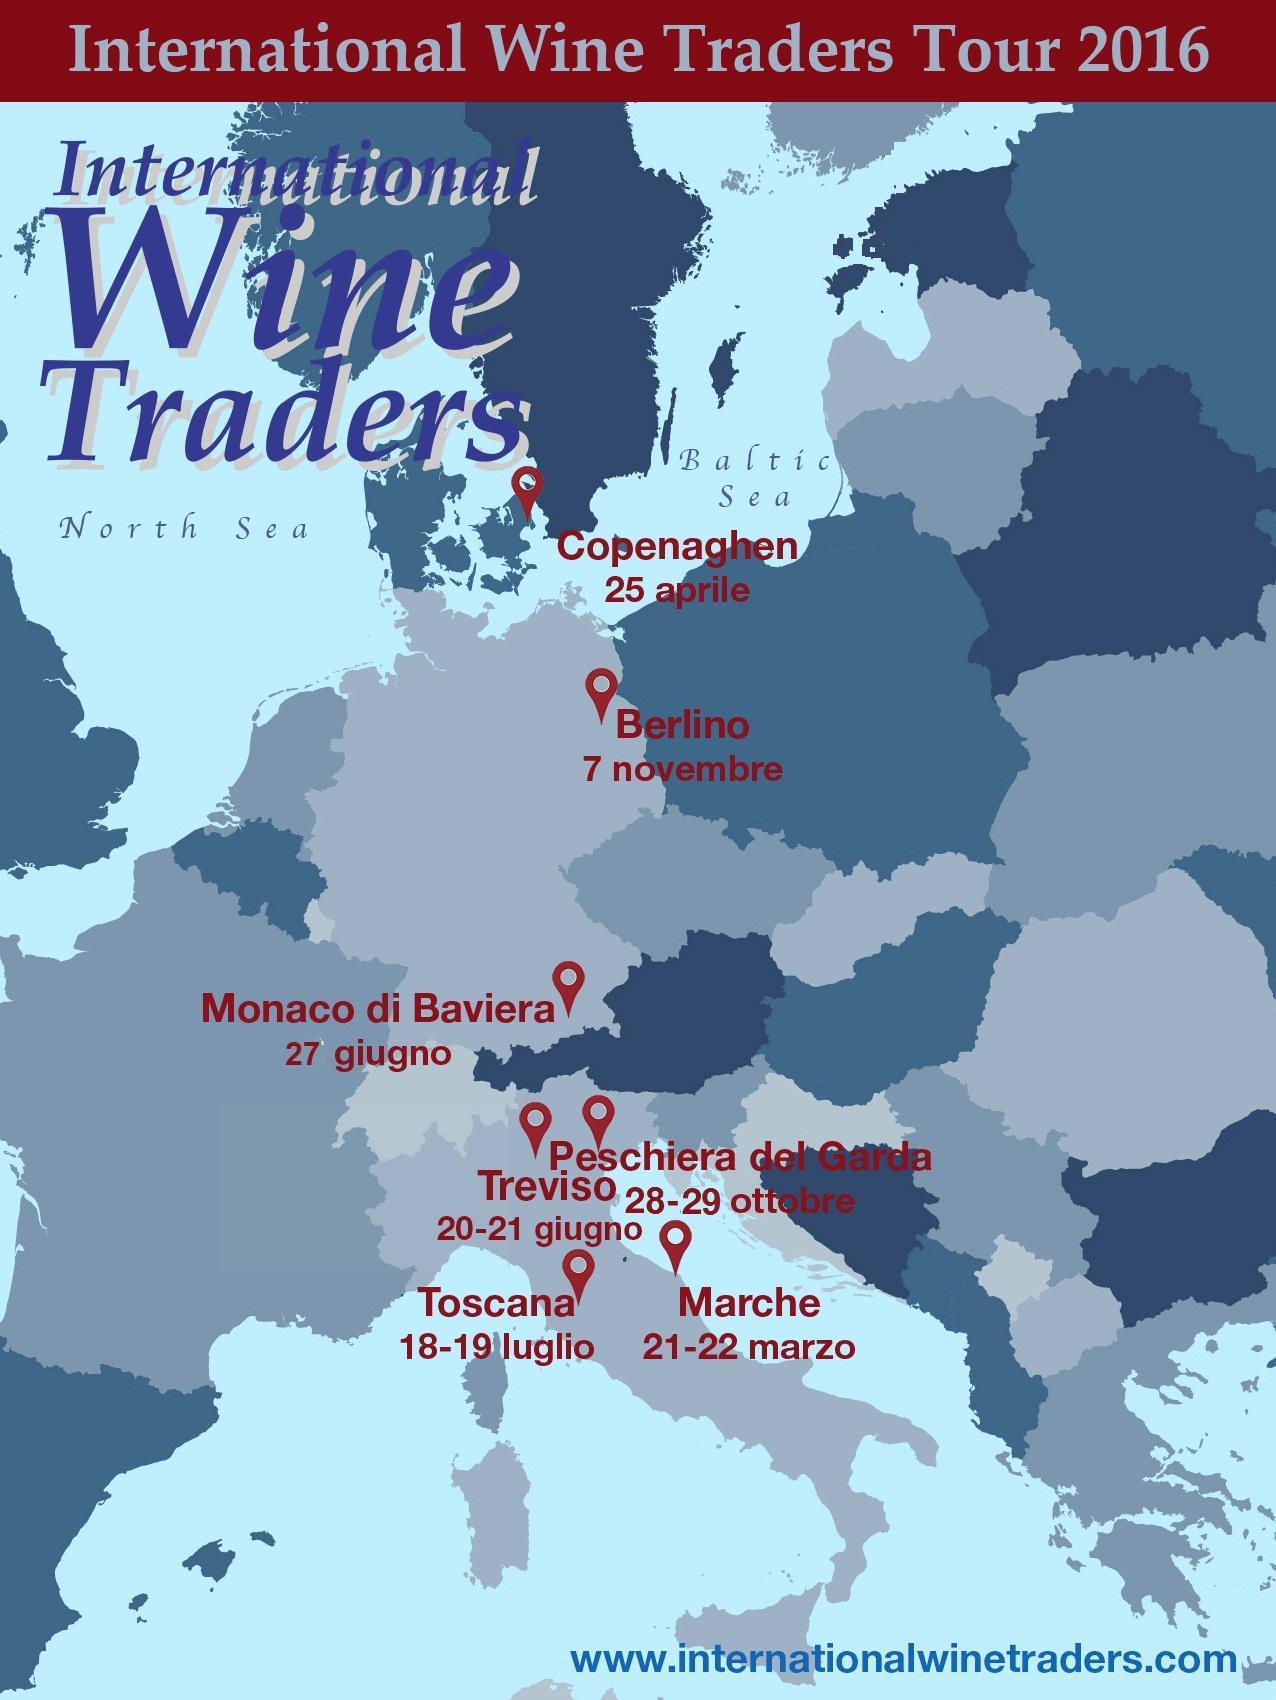 Calendario Tour International Wine Traders 2016